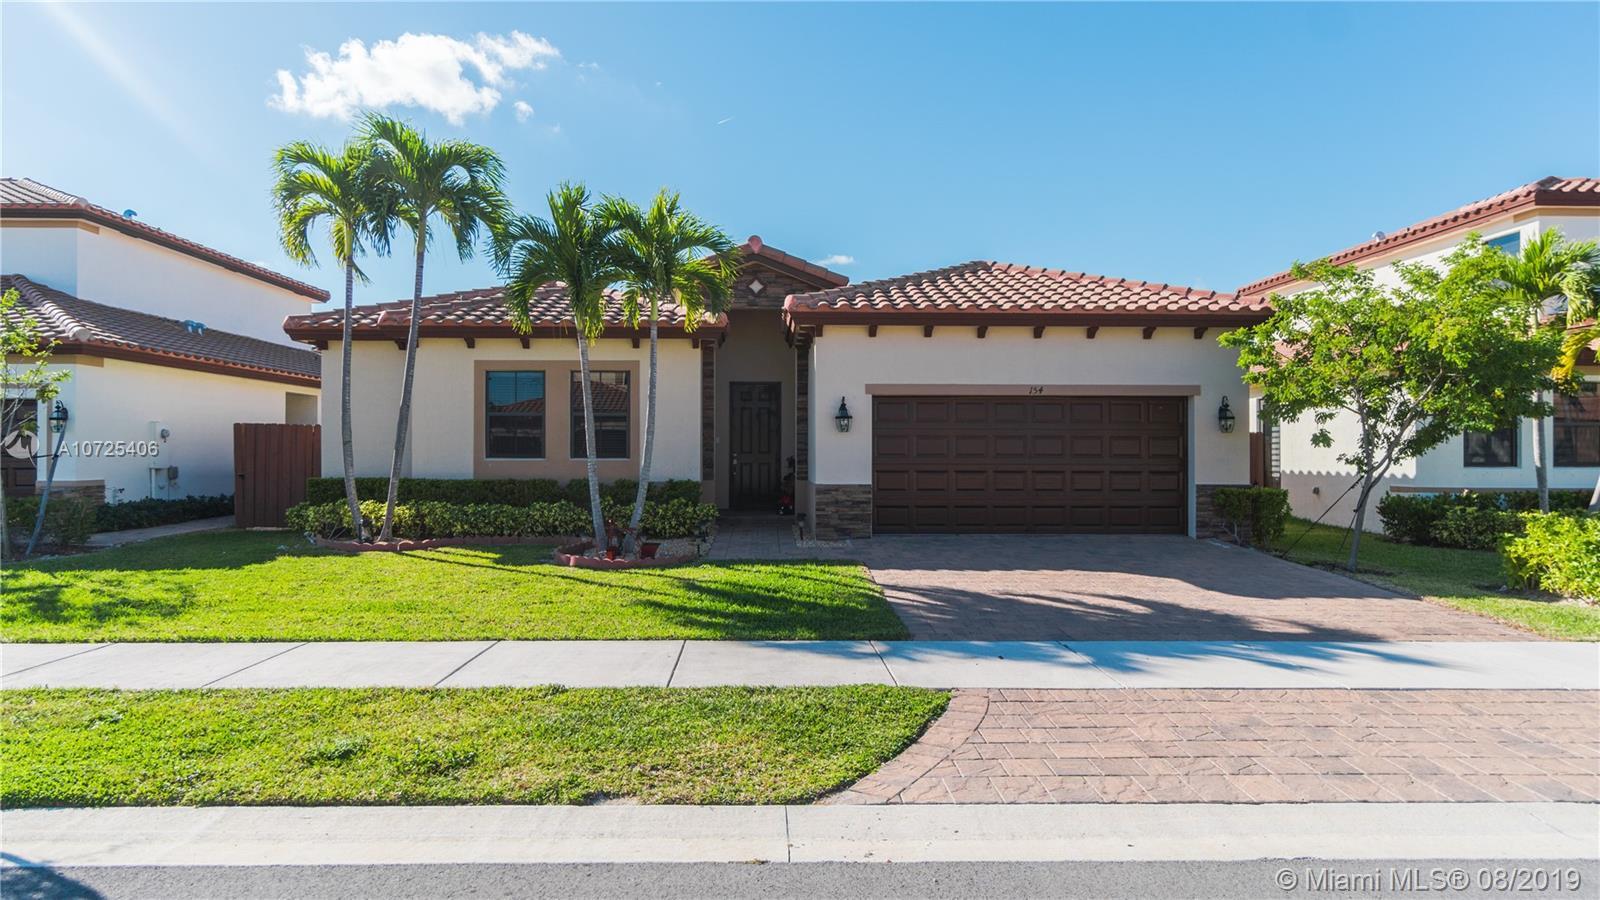 154 SE 35th Ave, Homestead, FL 33033 - Homestead, FL real estate listing